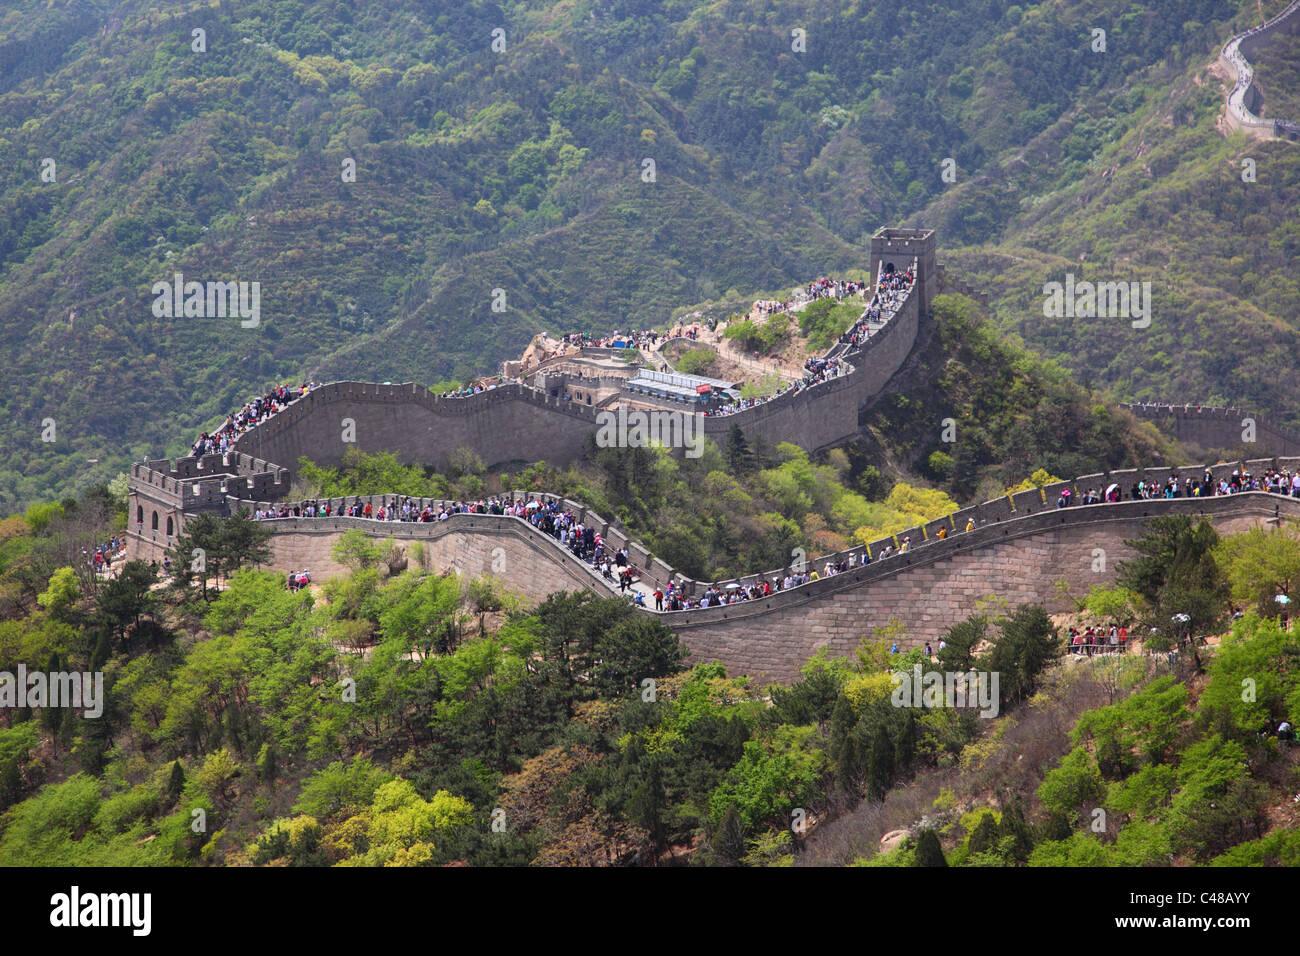 Great Wall Of China, Beijing, China Stockbild